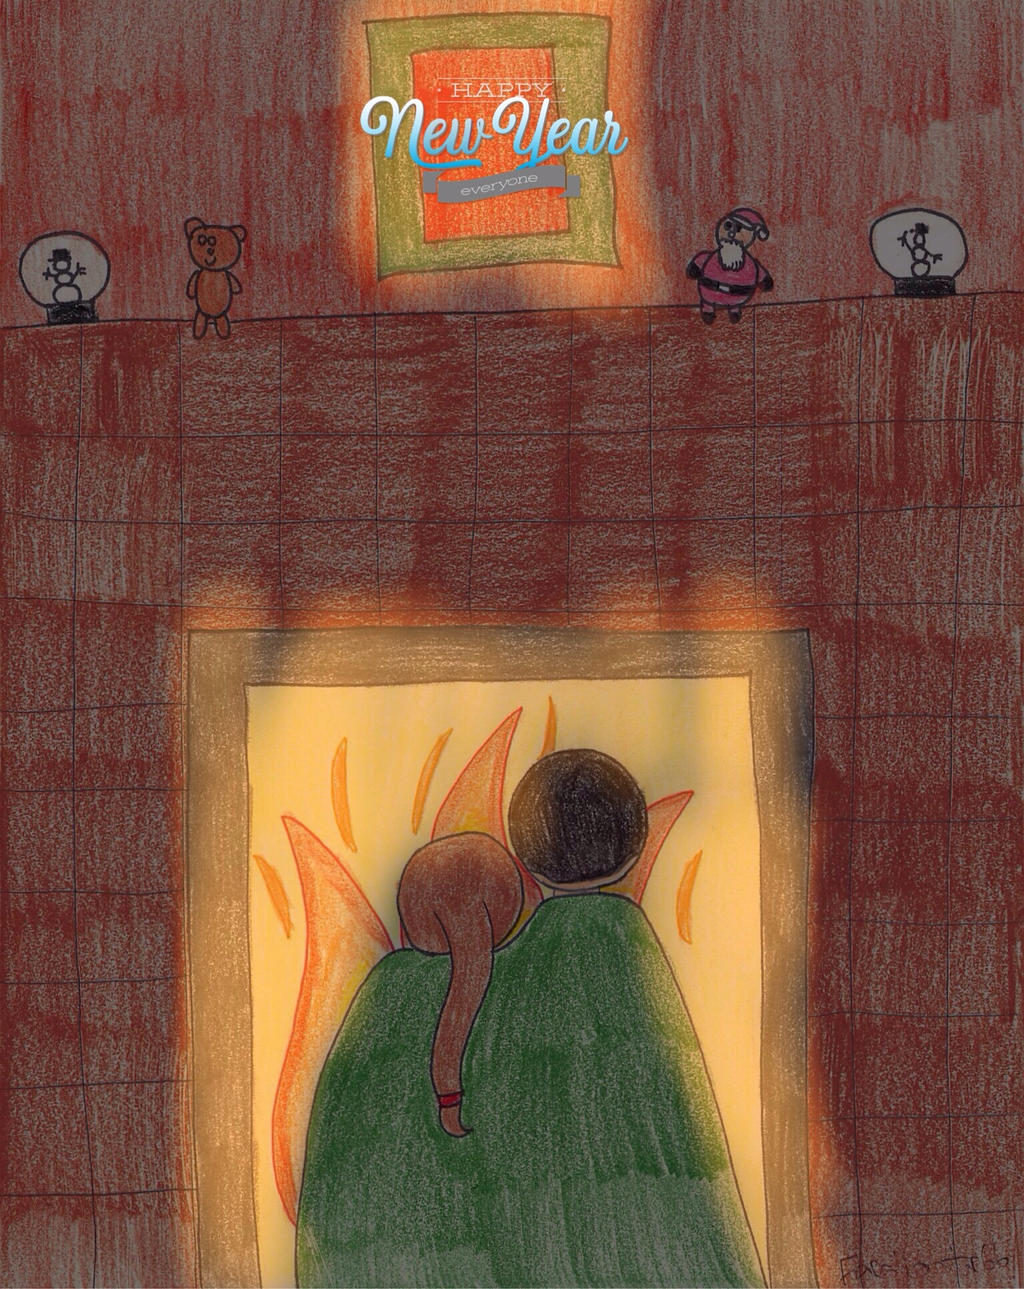 By the Fireside by Feraligatr66